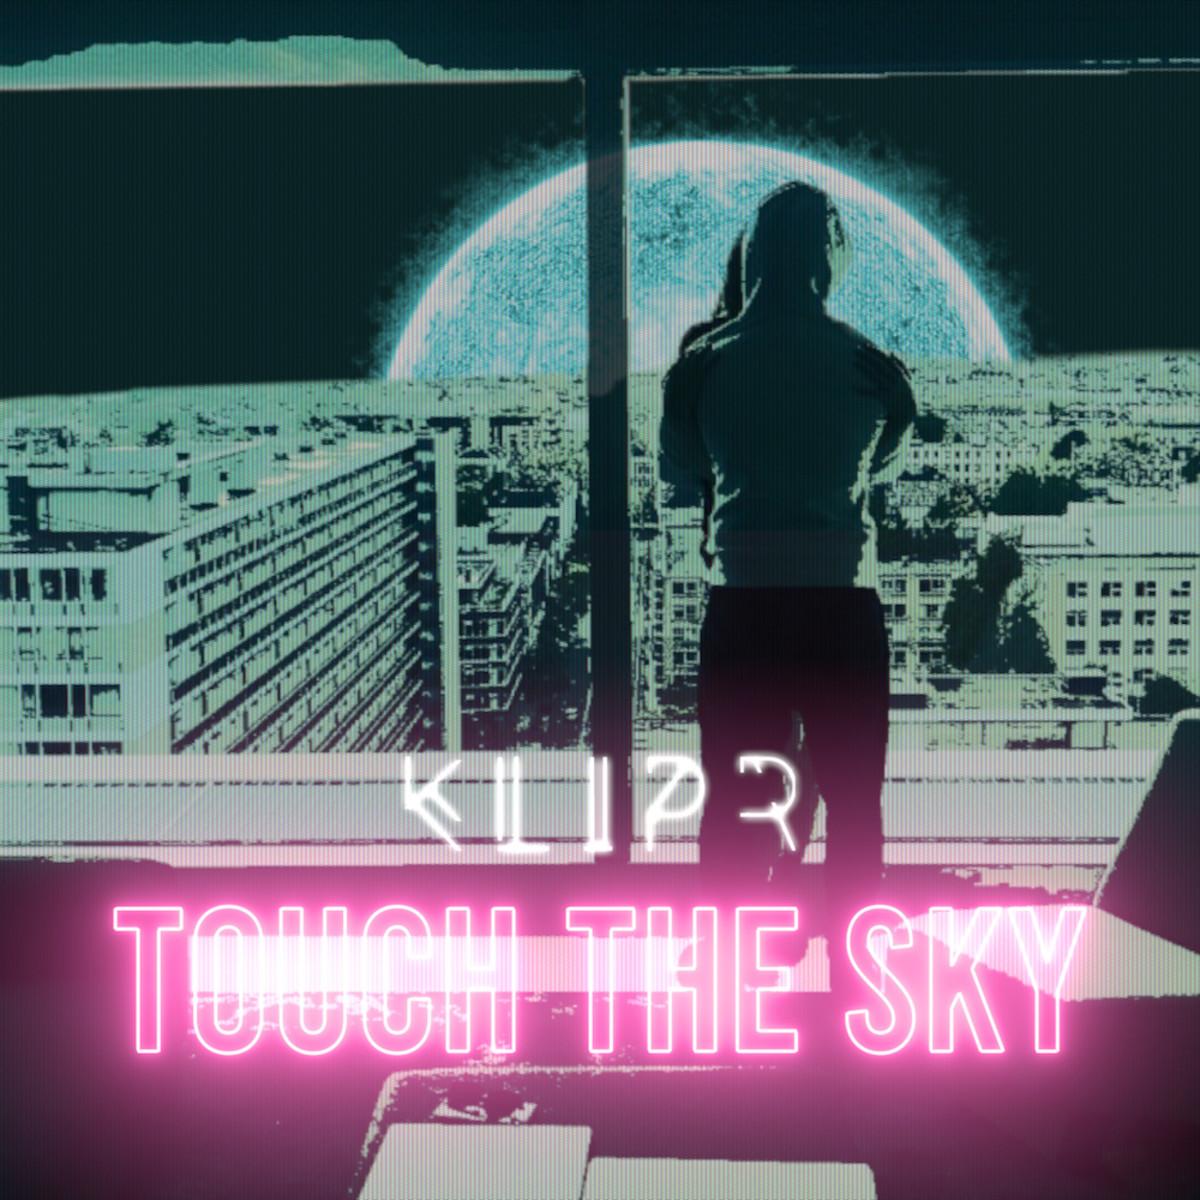 KLIPR - TOuch The Sky (ALBUM ART)